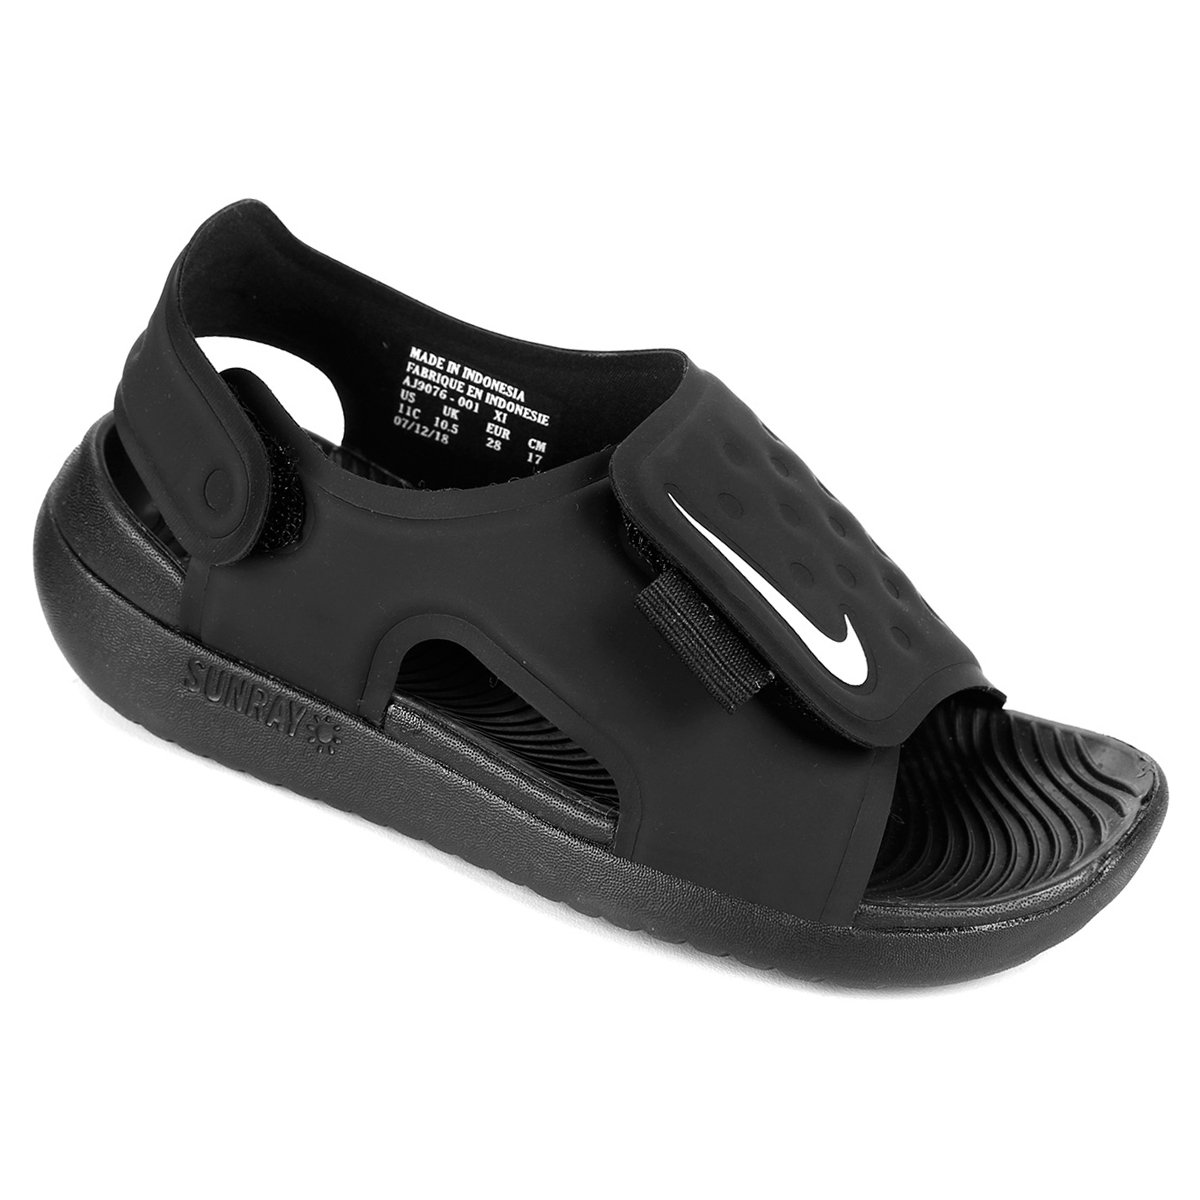 34dfde4c8 Sandália Infantil Nike Sunray Adjust 5 - Tam: 31 - Shopping TudoAzul